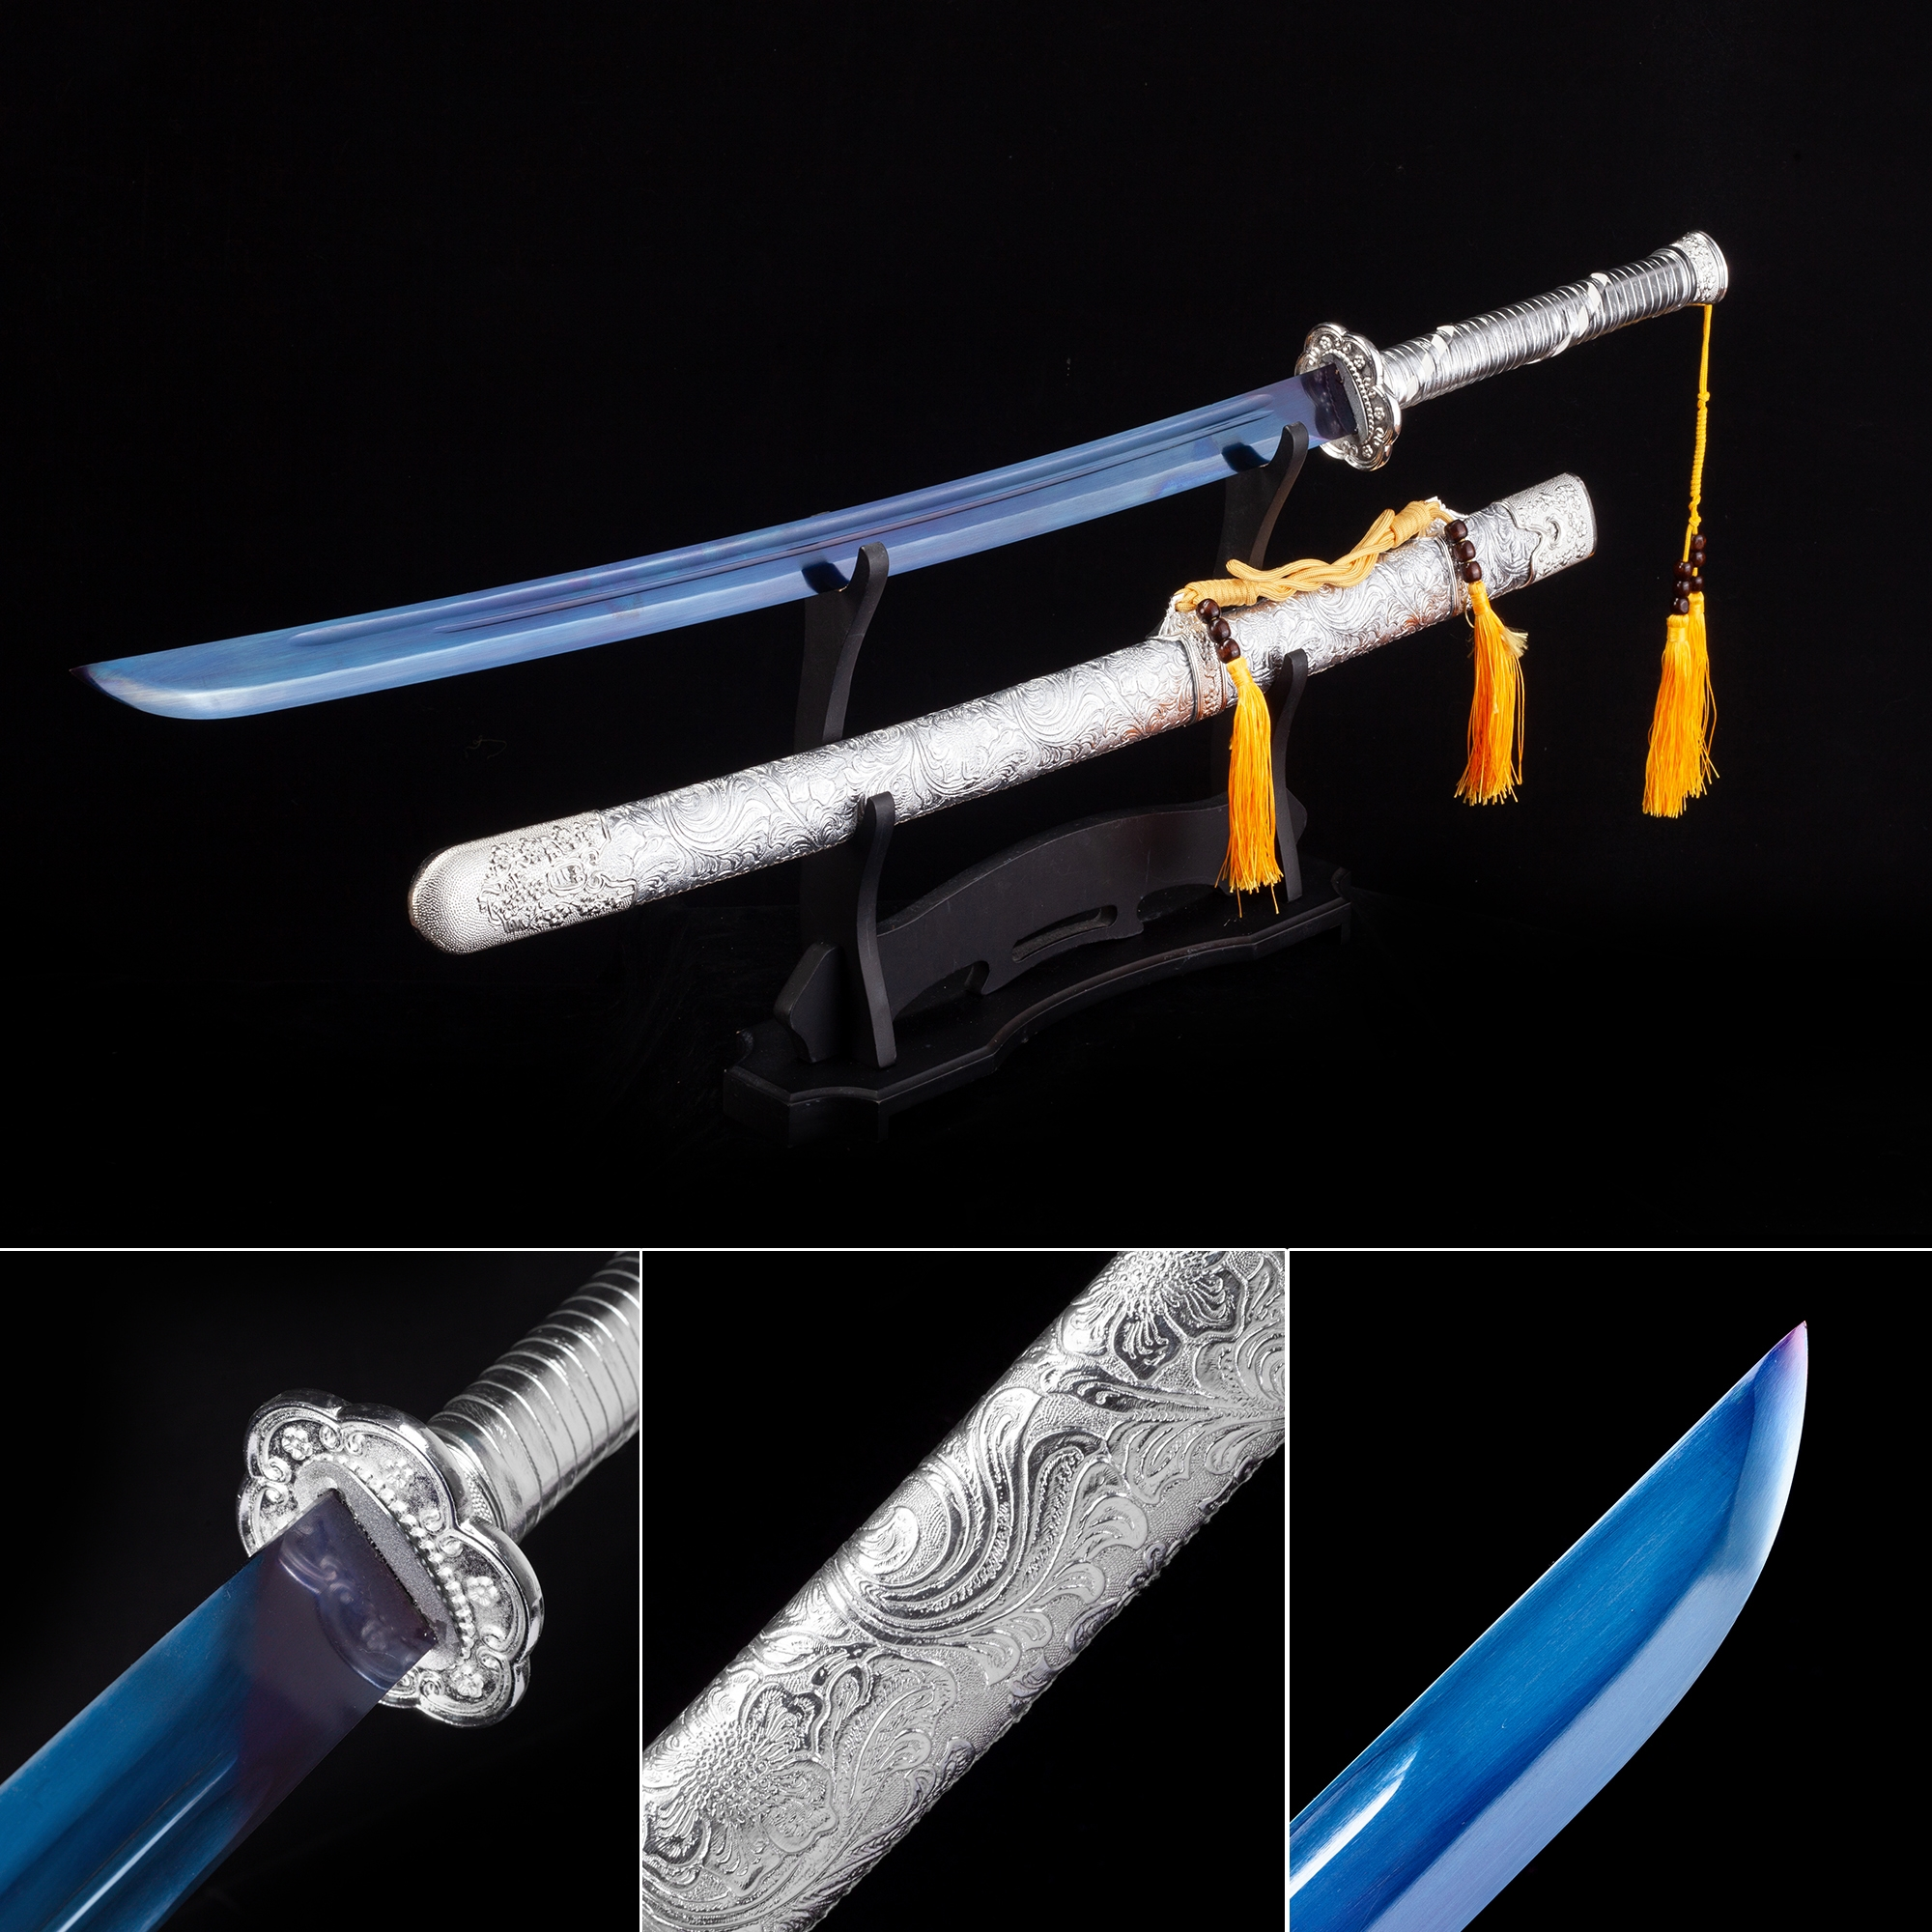 Handmade High Manganese Steel Blue Blade Japanese Katana Samurai Swords With Silver Scabbard